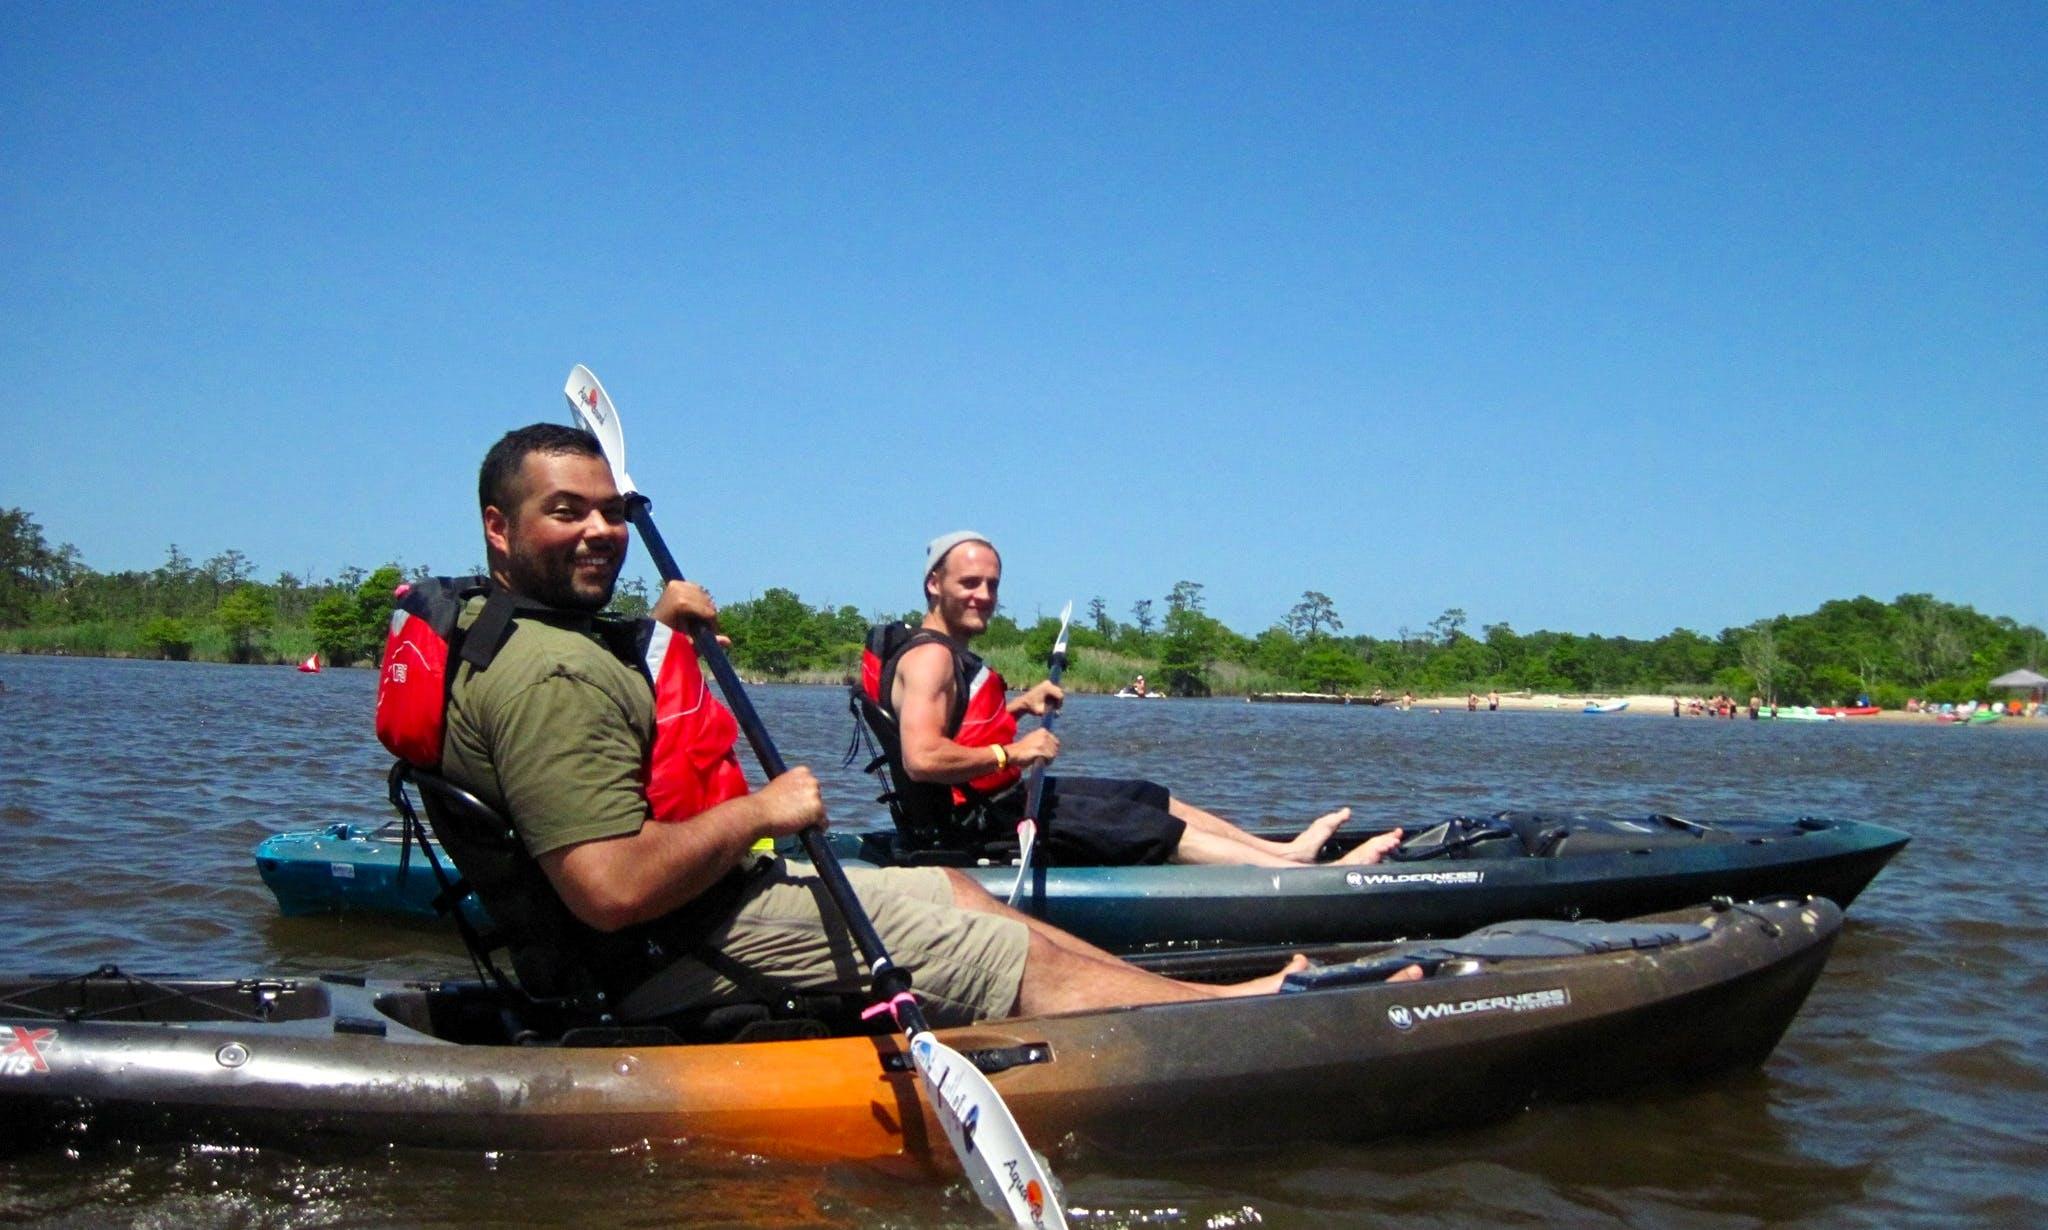 Kayak Rental in Virginia Beach